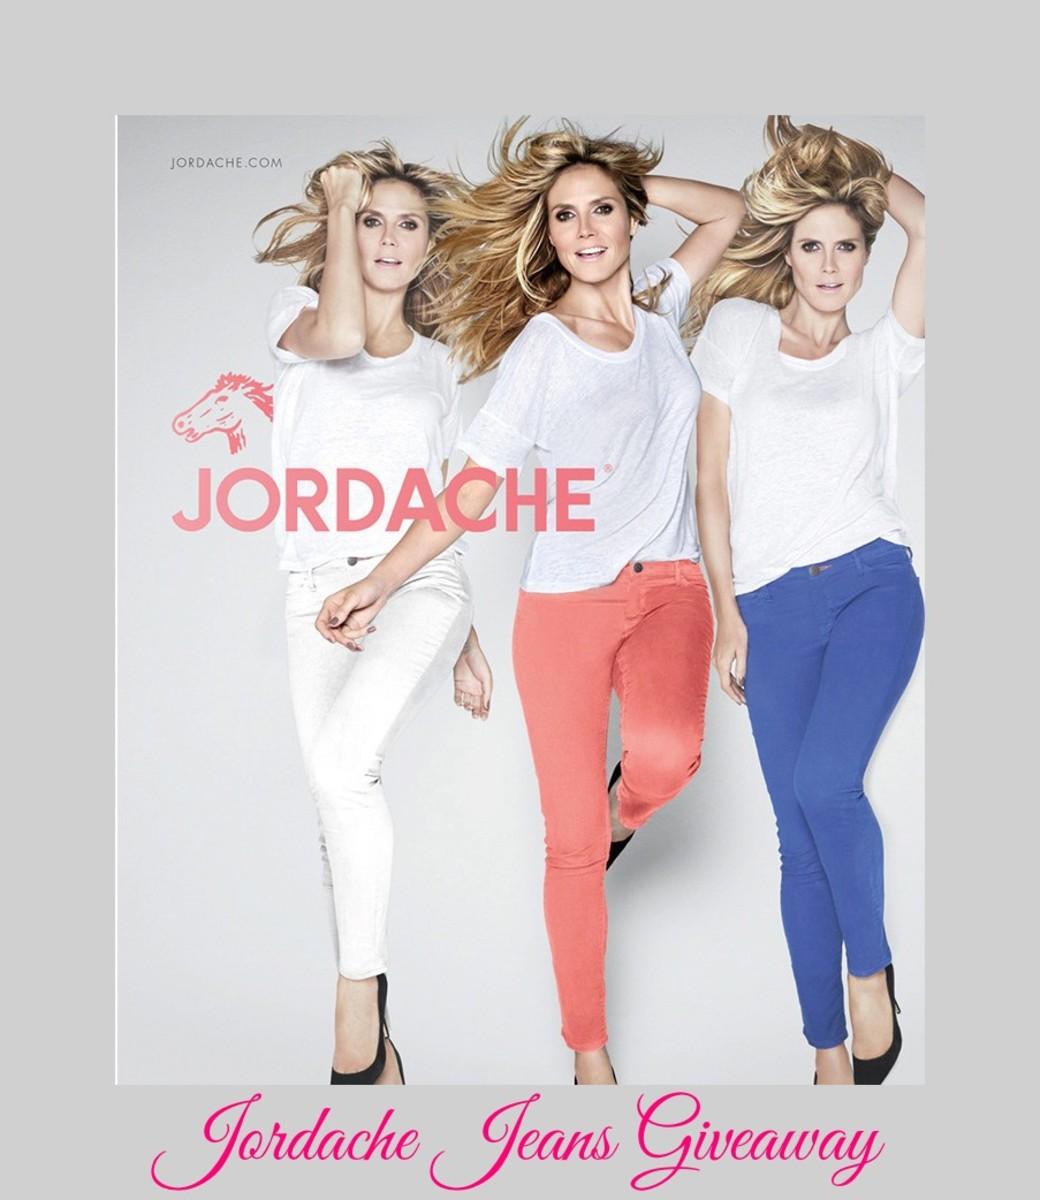 Jordache Jeans Giveaway